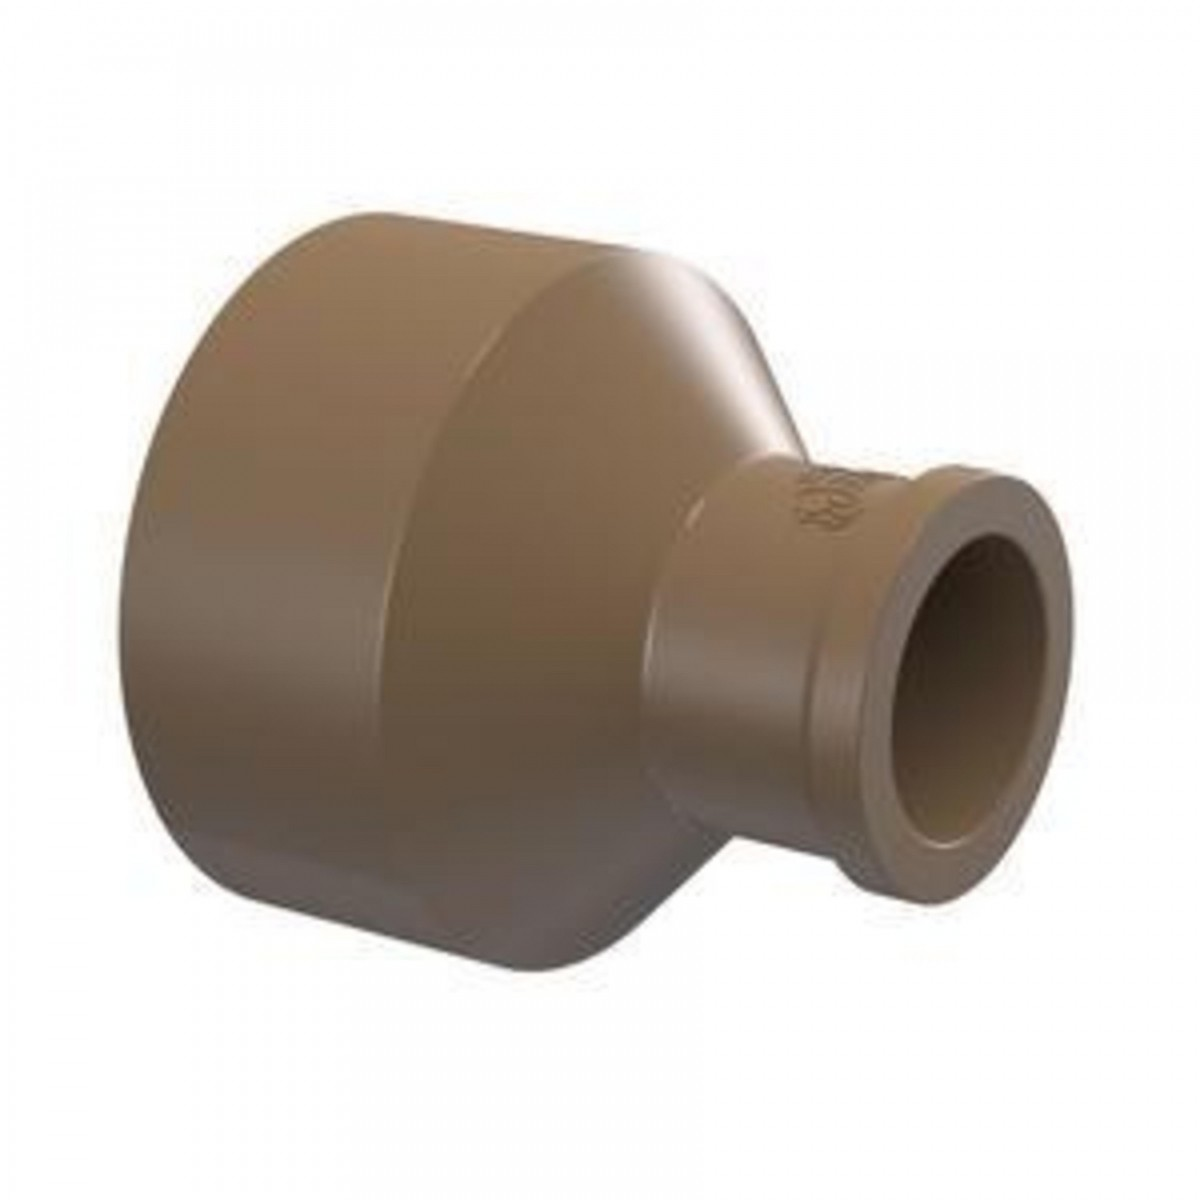 Solda Bucha de Redução Longa 50x32mm (1.1/2x1